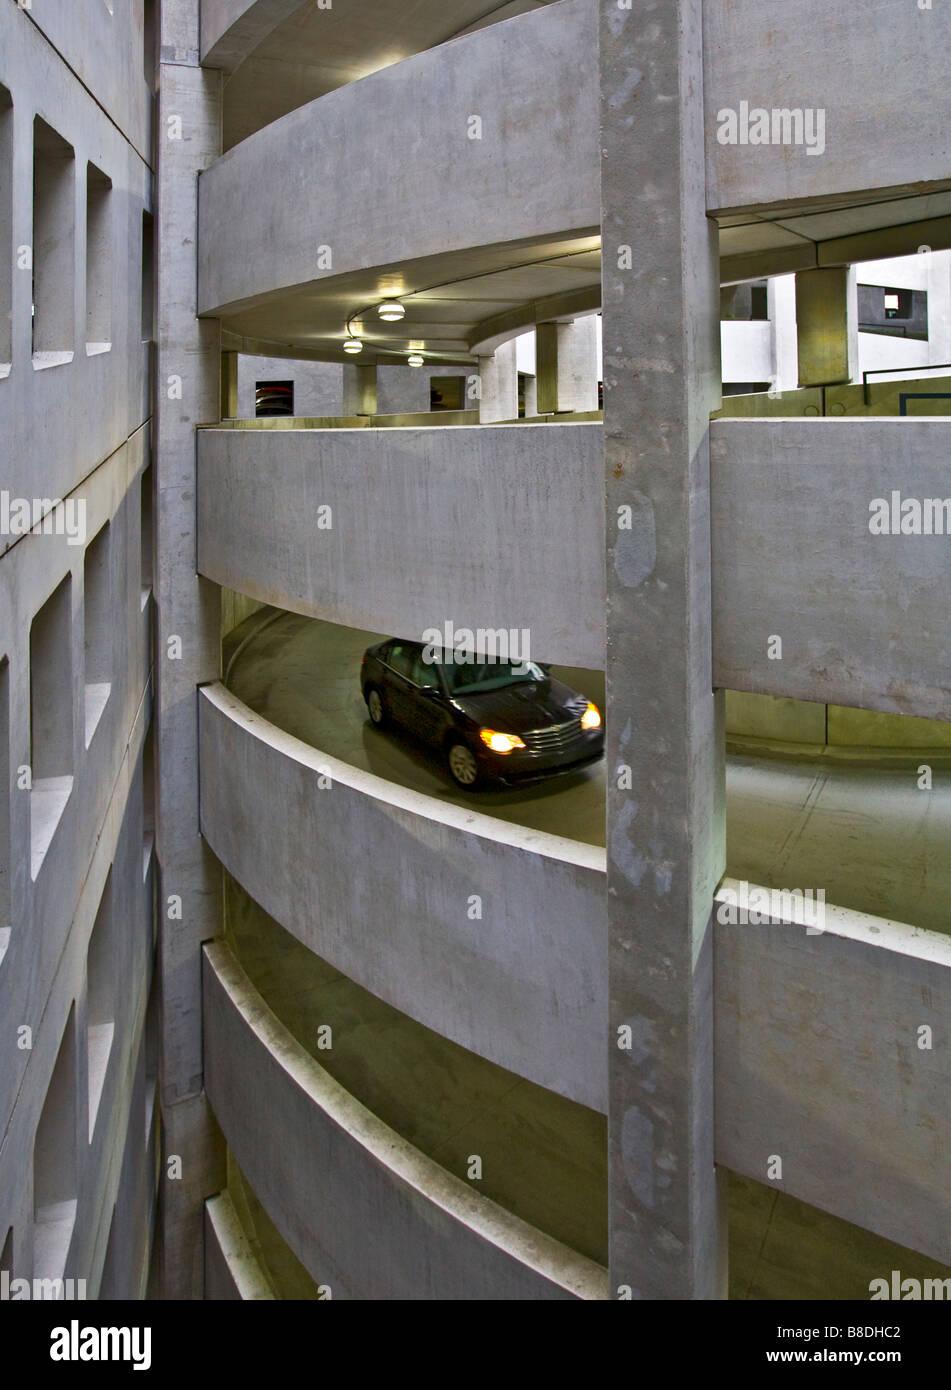 Detroit Michigan The parking garage at the Greektown Casino hotel - Stock Image